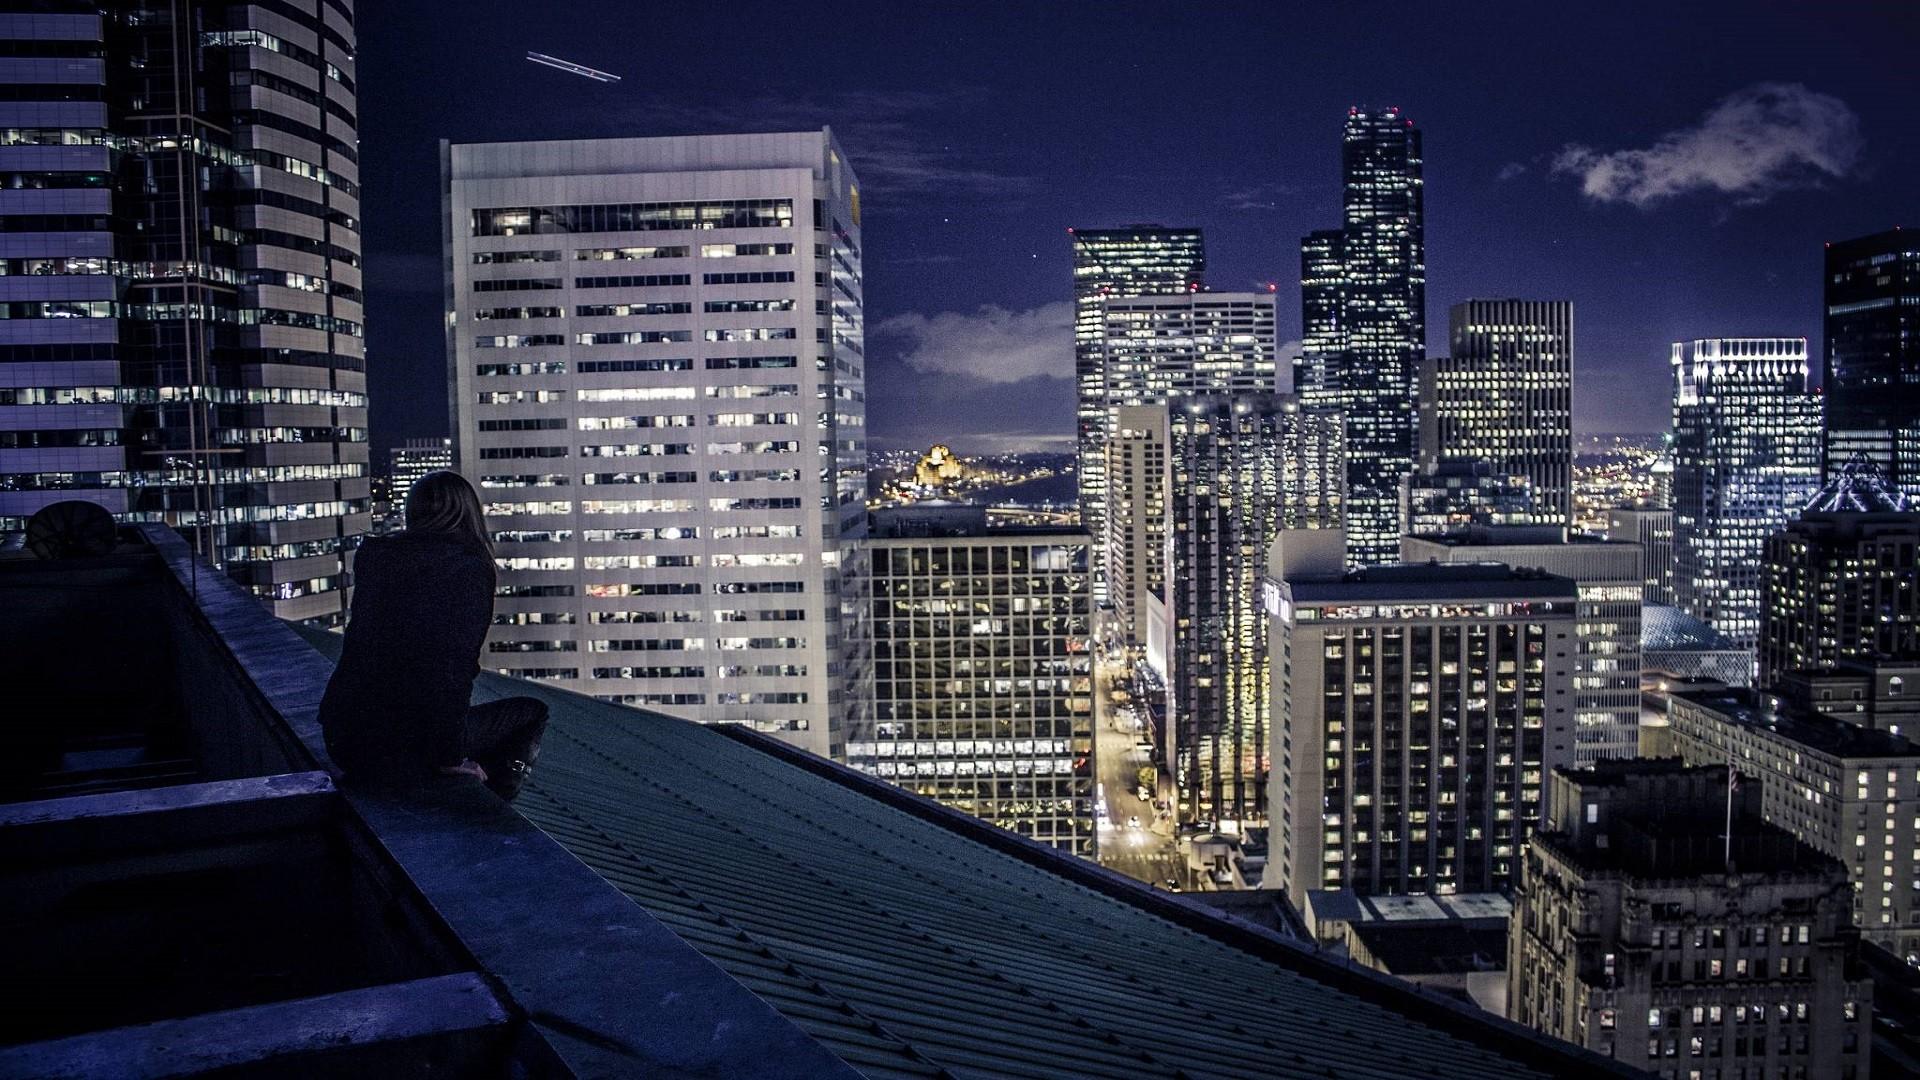 Картинке на крыше